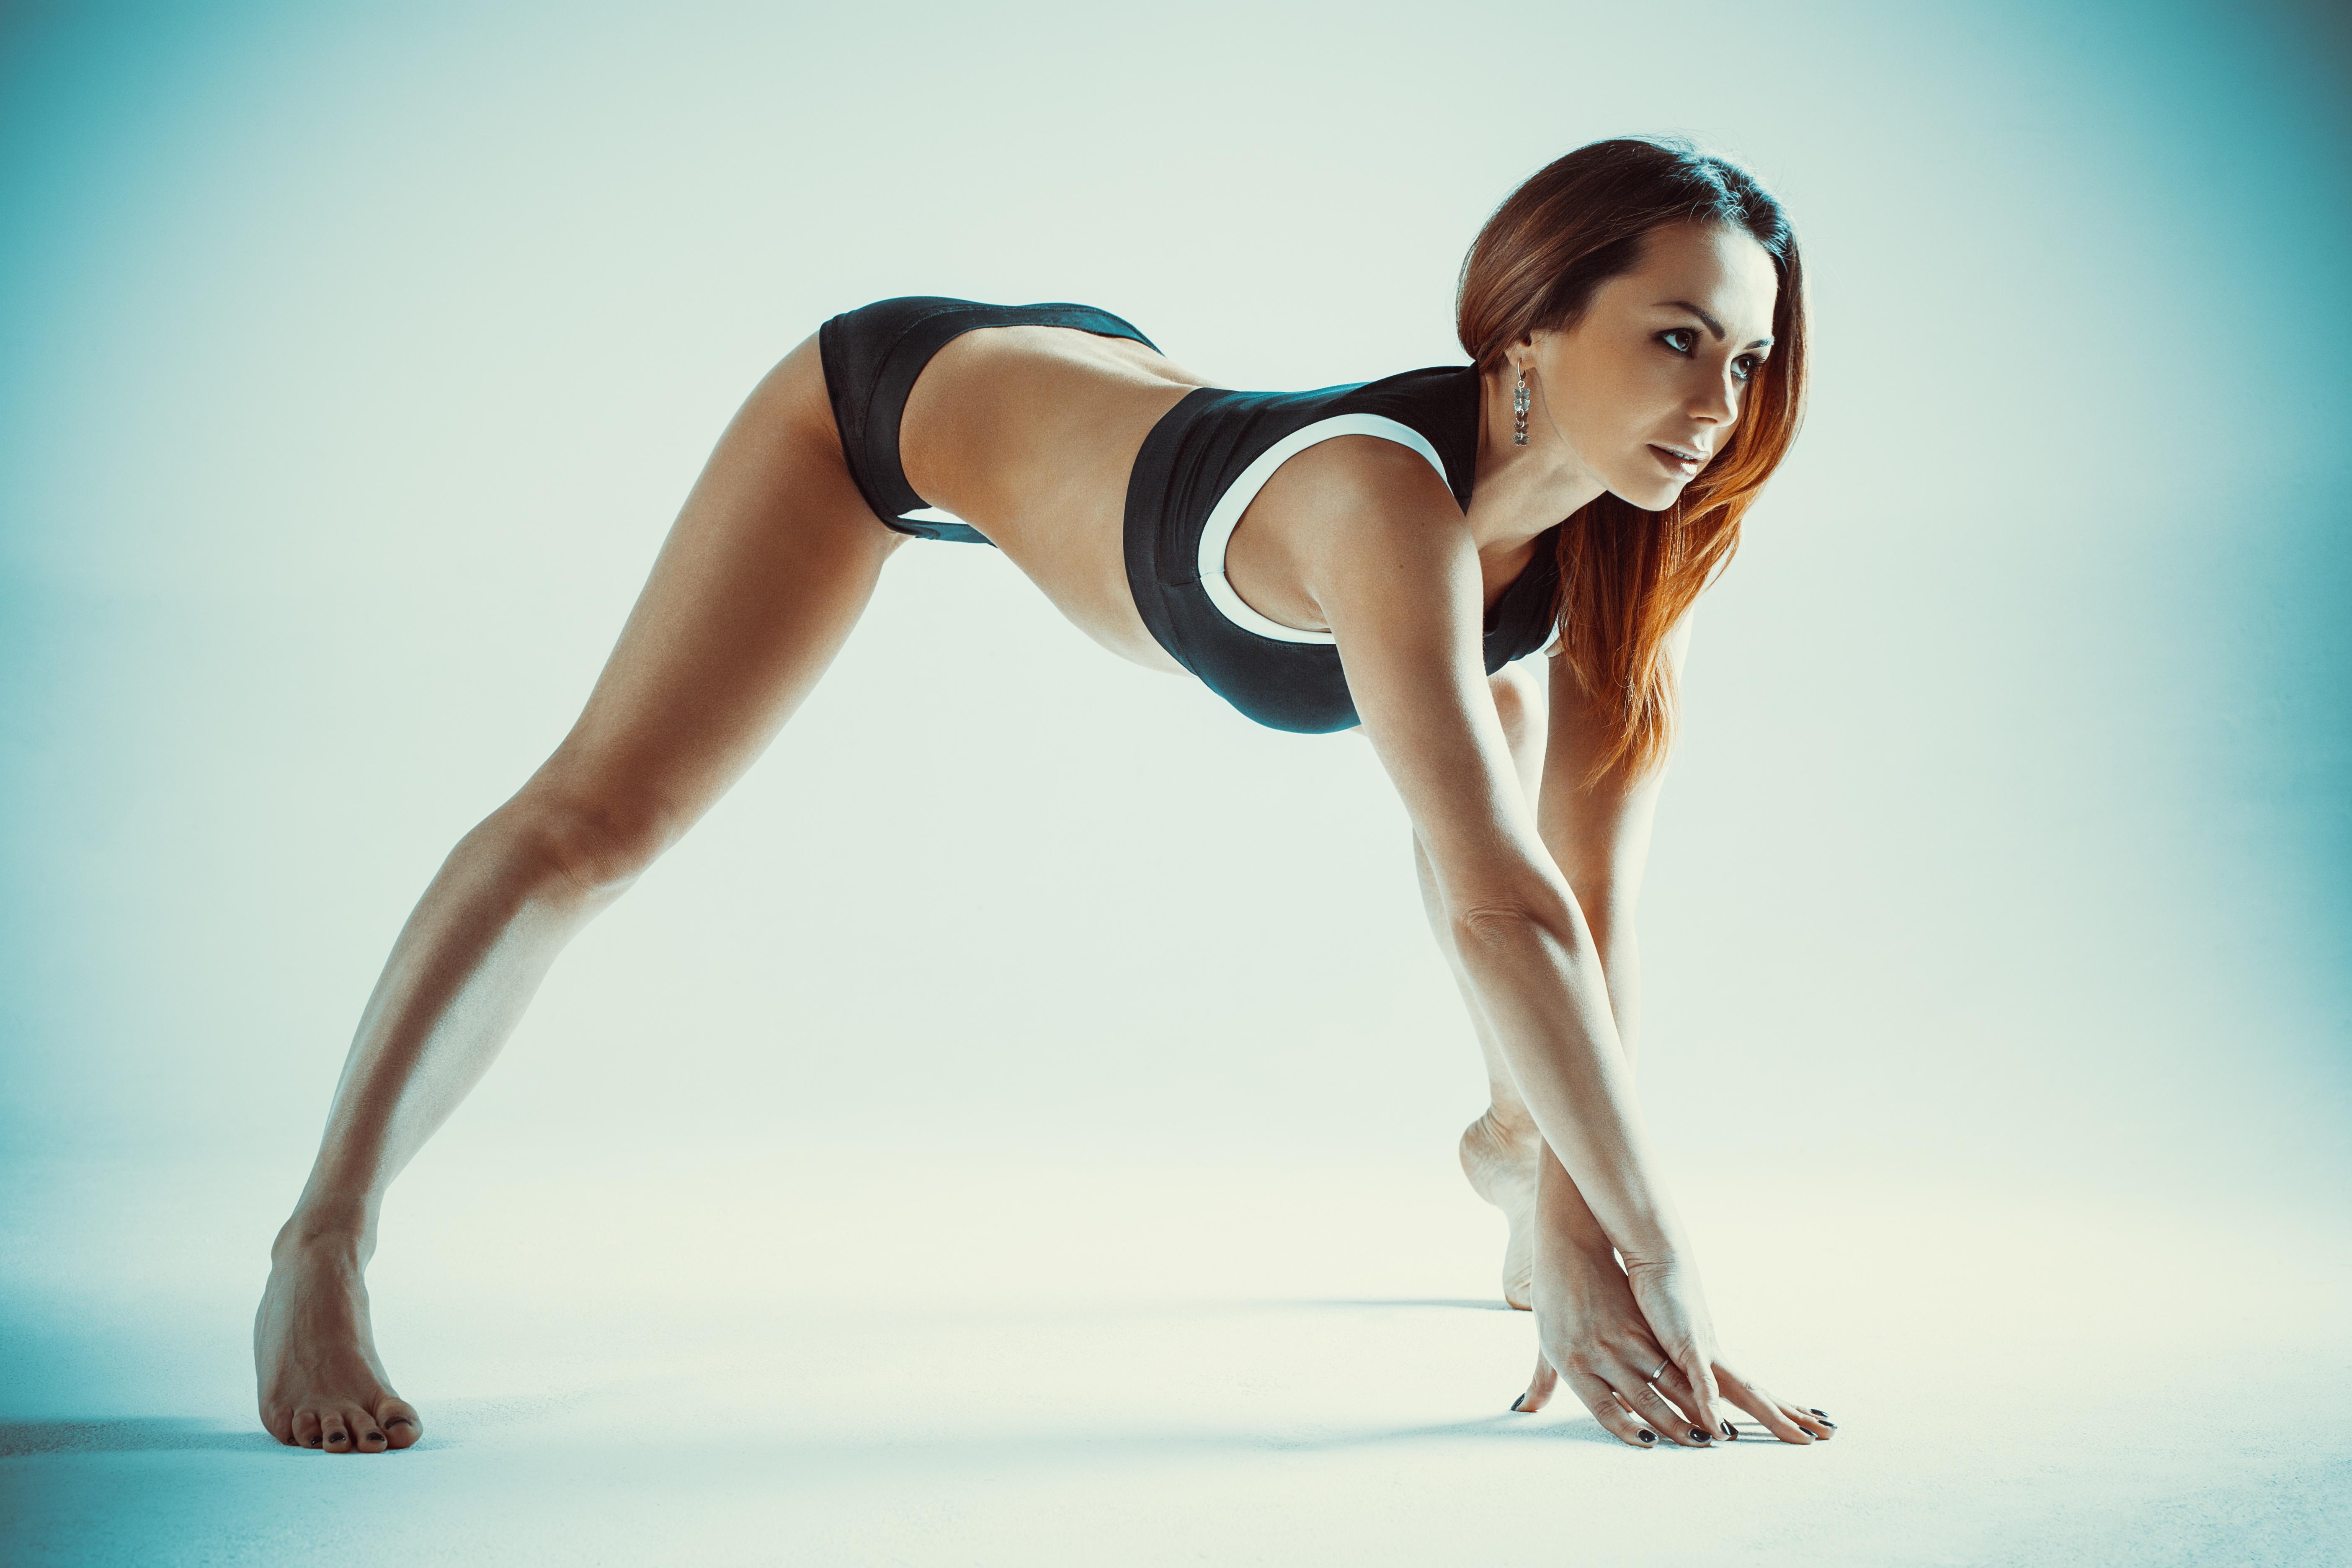 Women Brunette Yoga Fitness Model Sportswear Thighs Barefoot